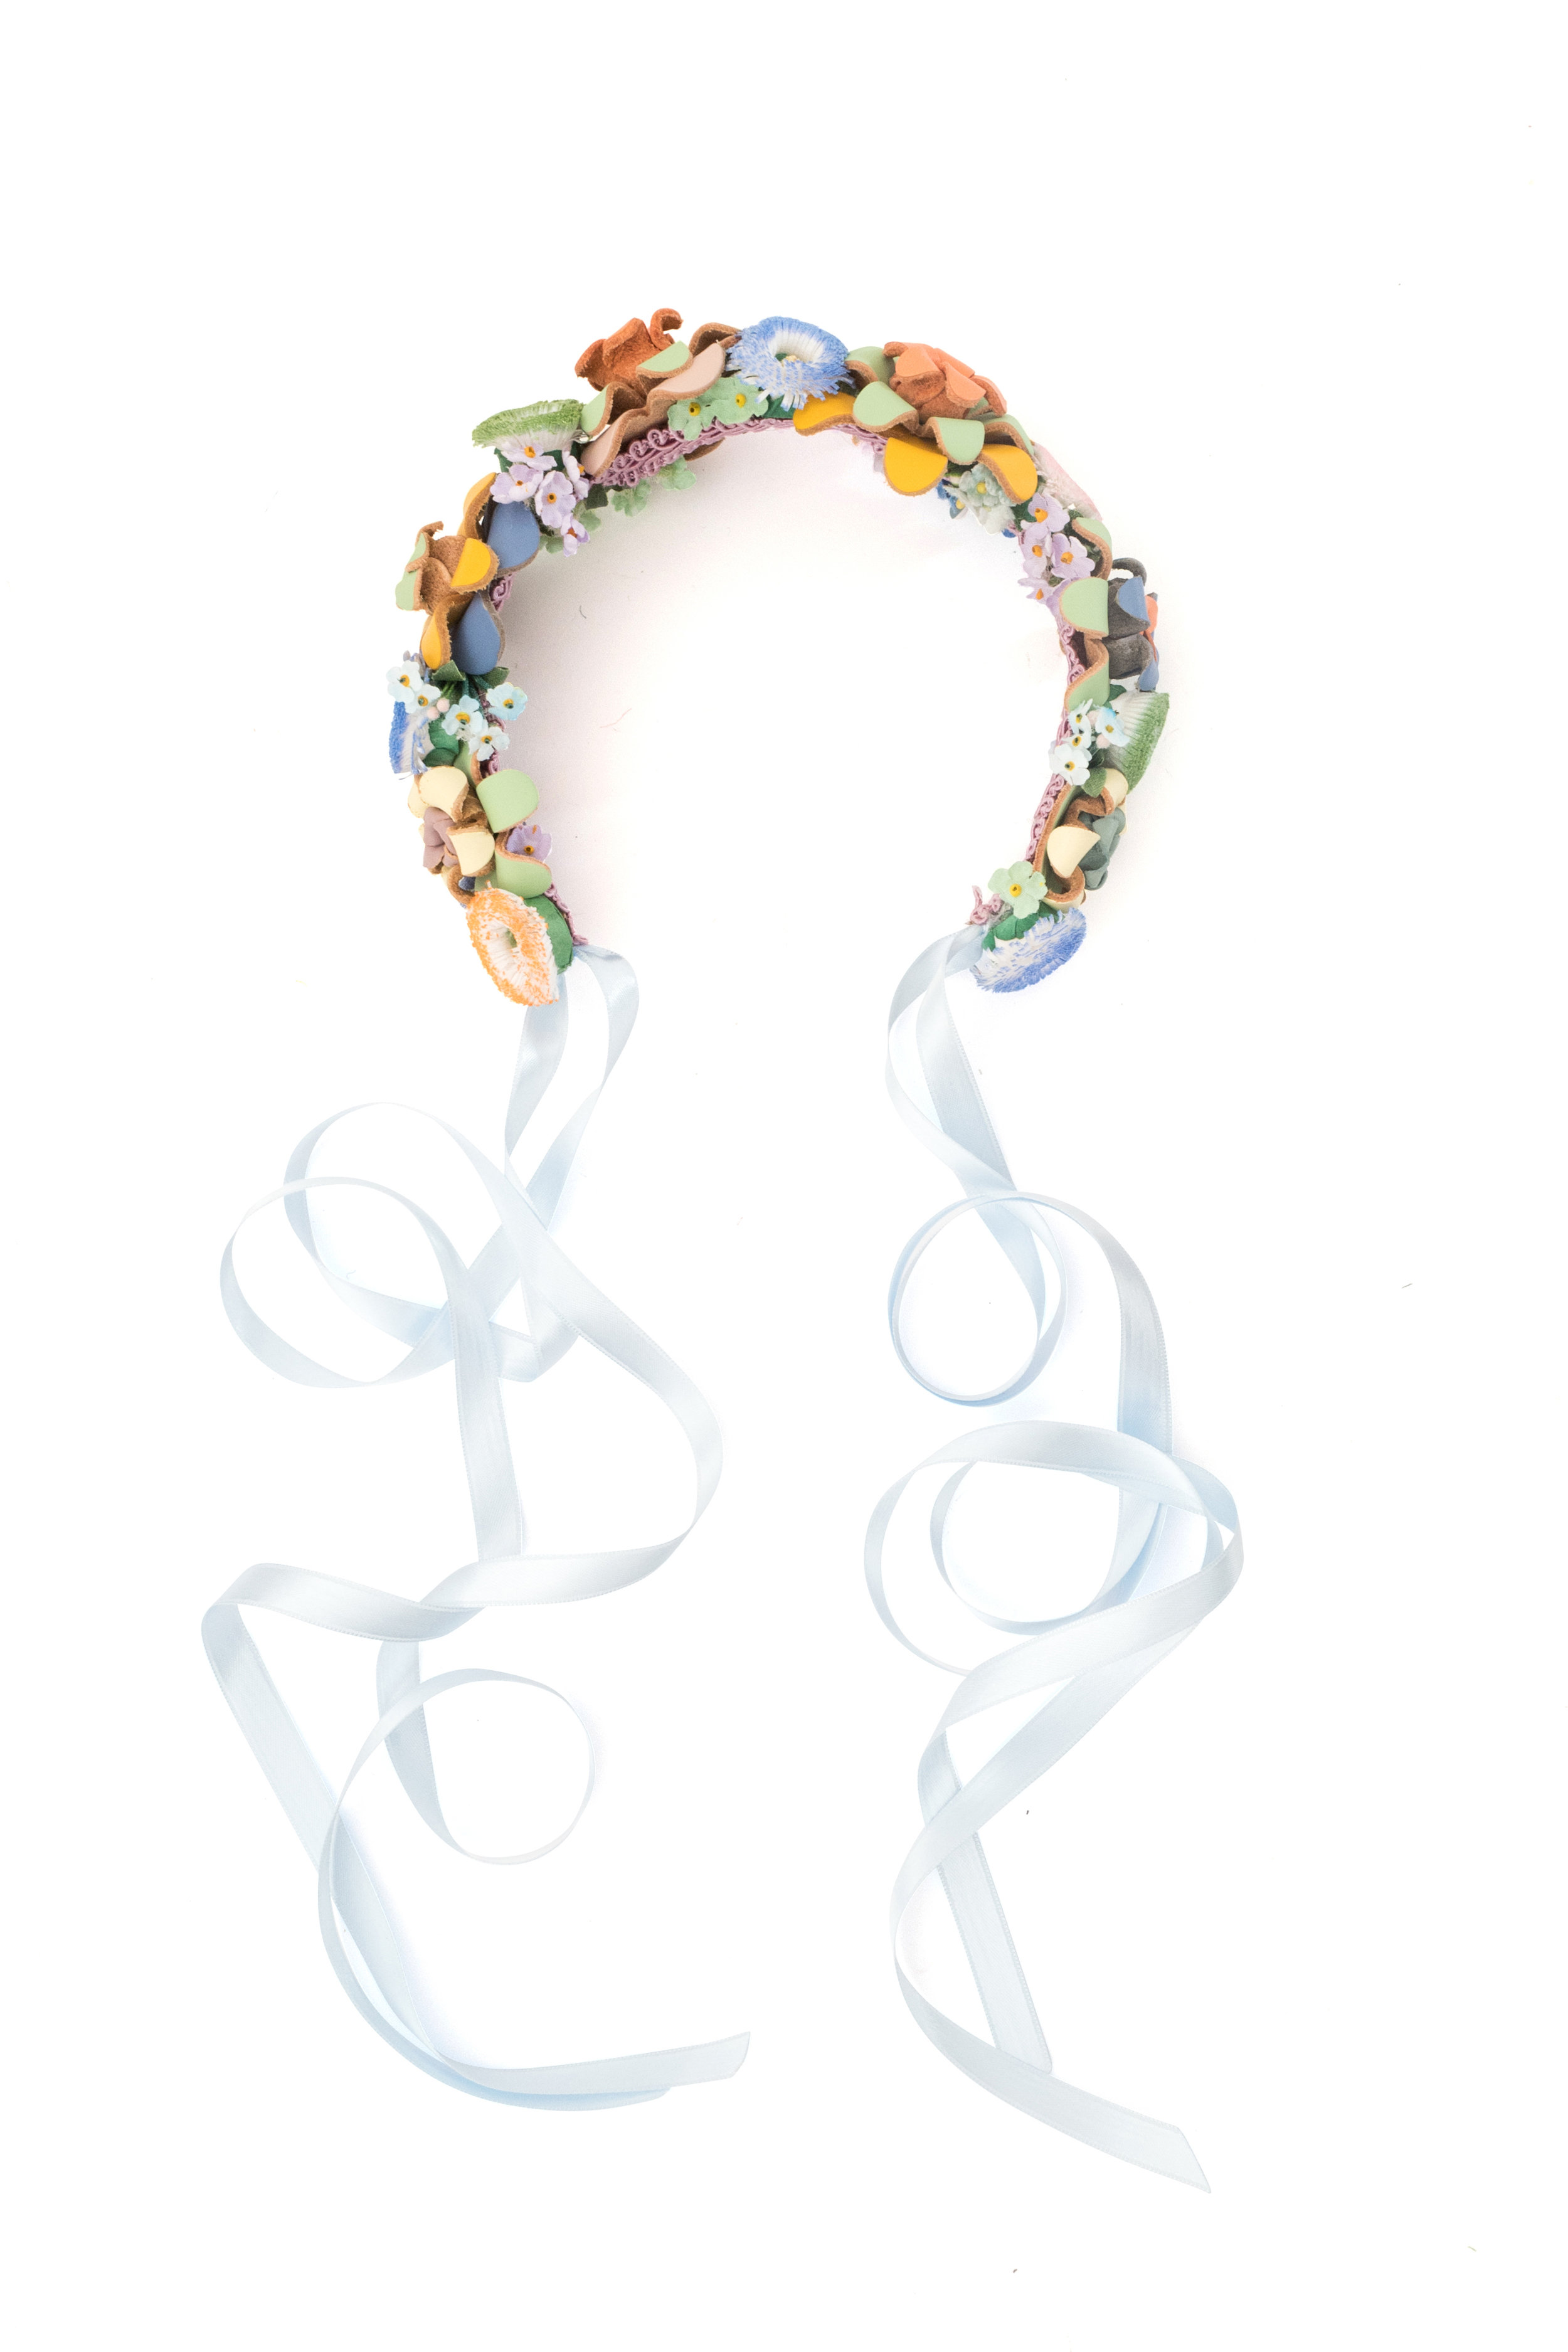 WeAreFlowergirls-Midsommar-Collection-Flowercrown-Marini-€109-cropped.jpg